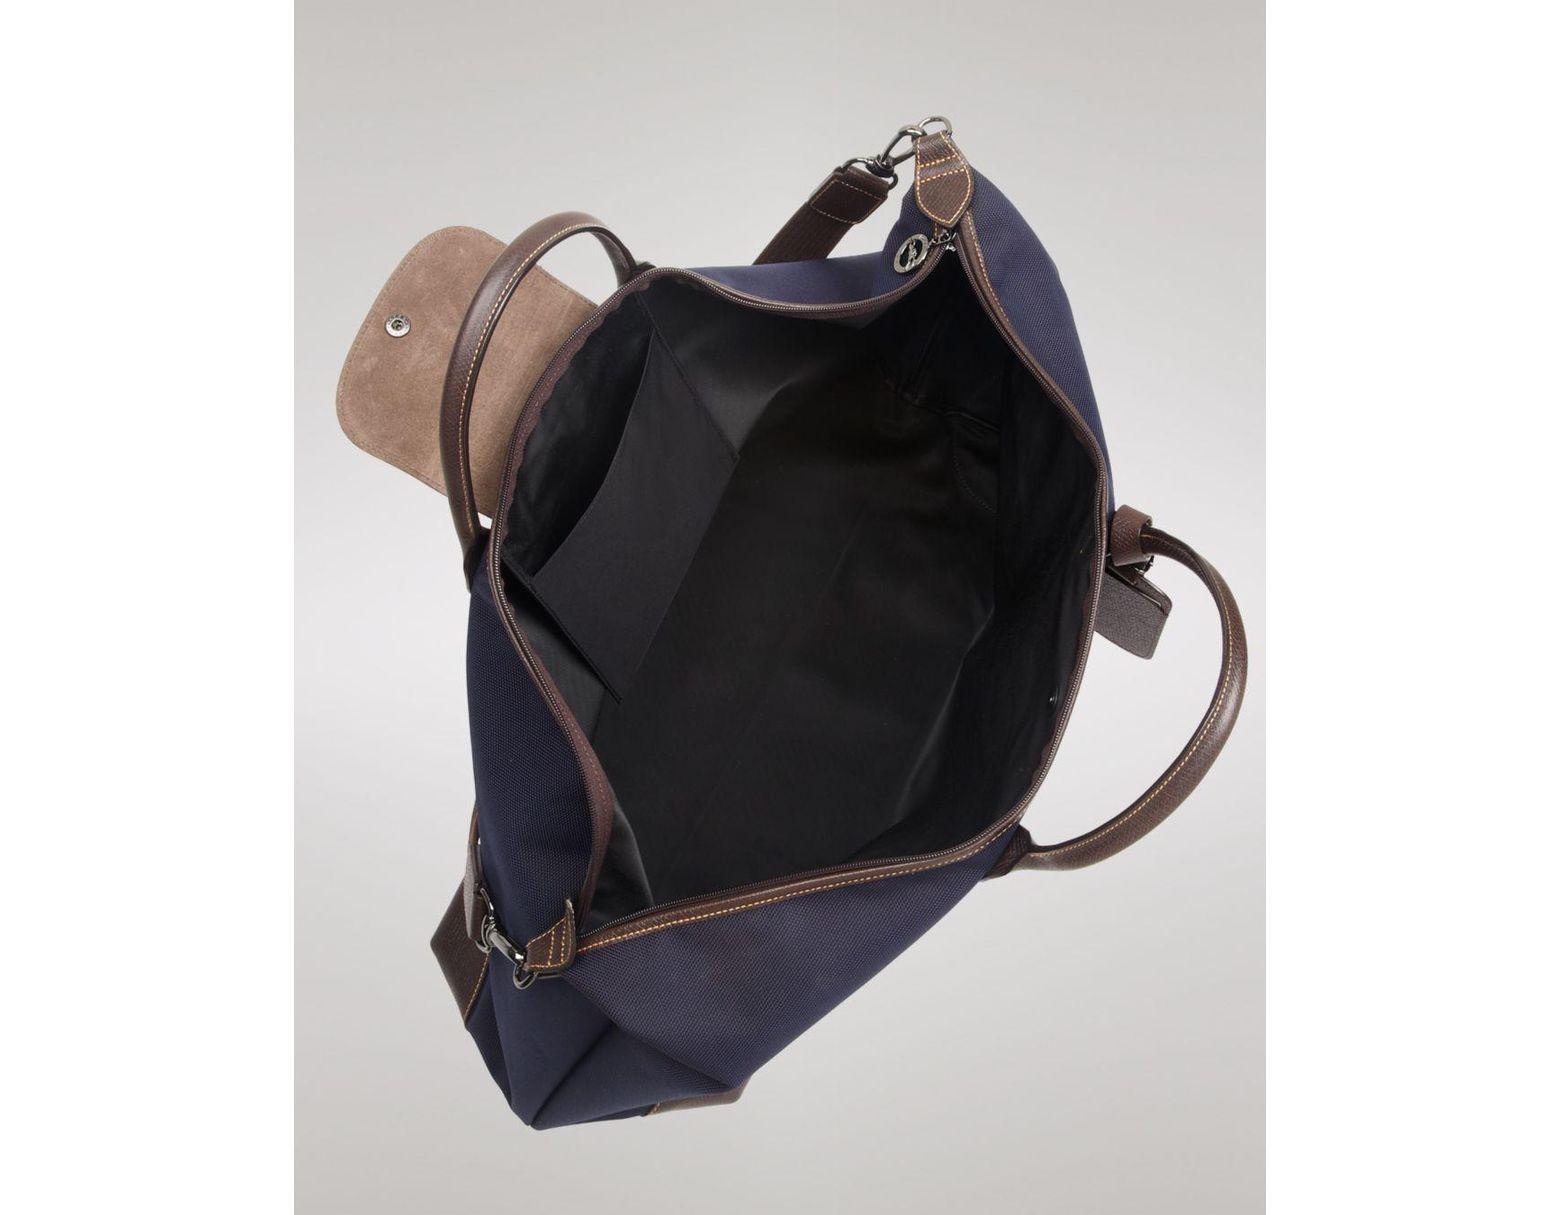 8f054e98b10a Boxford Extra Large Travel Bag | Building Materials Bargain Center